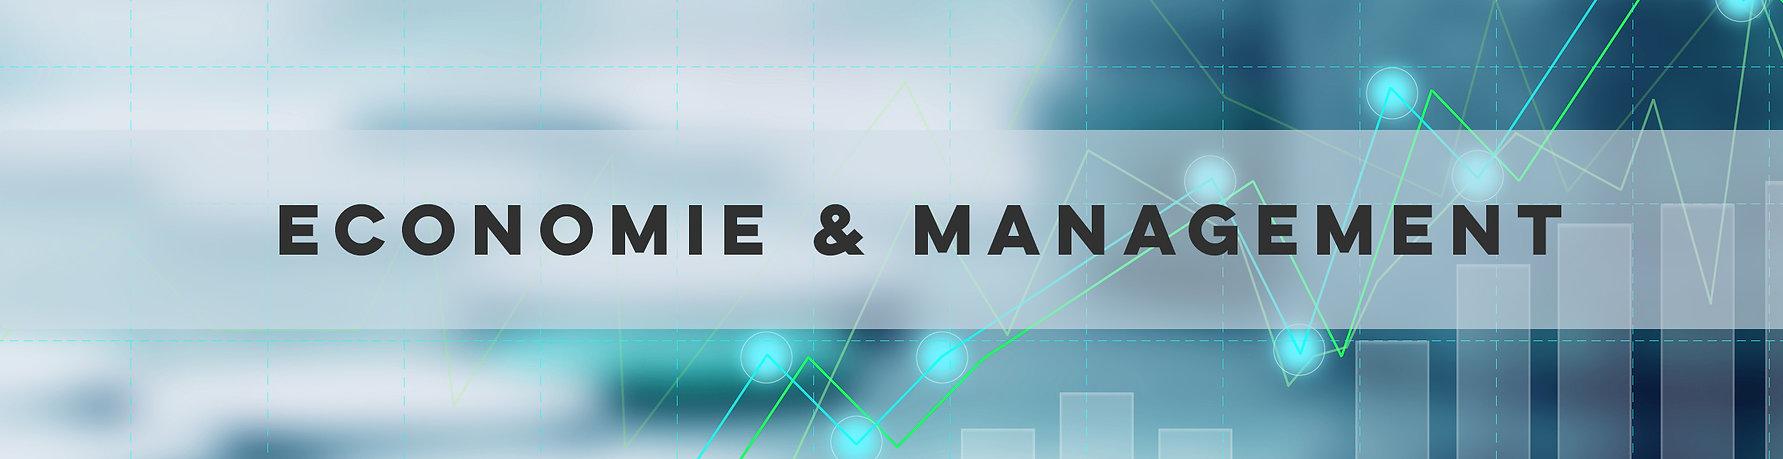 economie & management.jpg